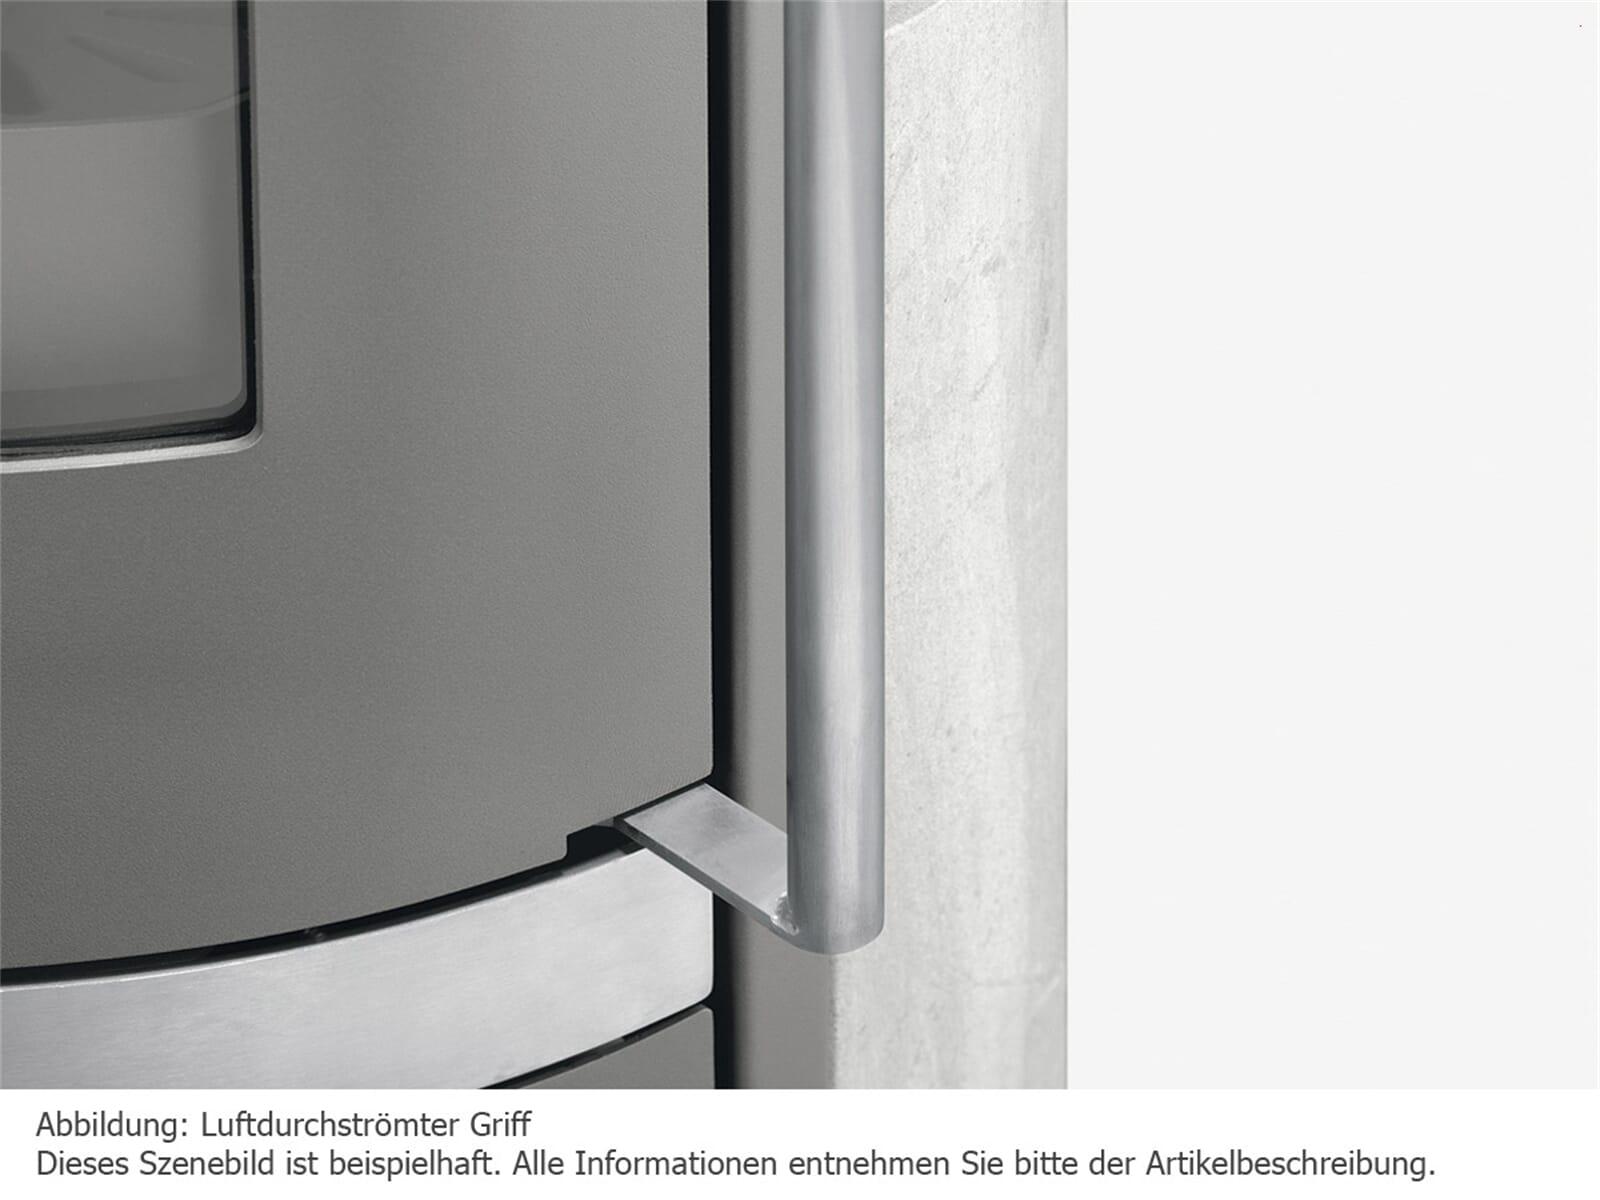 justus faro aqua 1250 65 kaminofen sandstein korpus stahl schwarz ebay. Black Bedroom Furniture Sets. Home Design Ideas